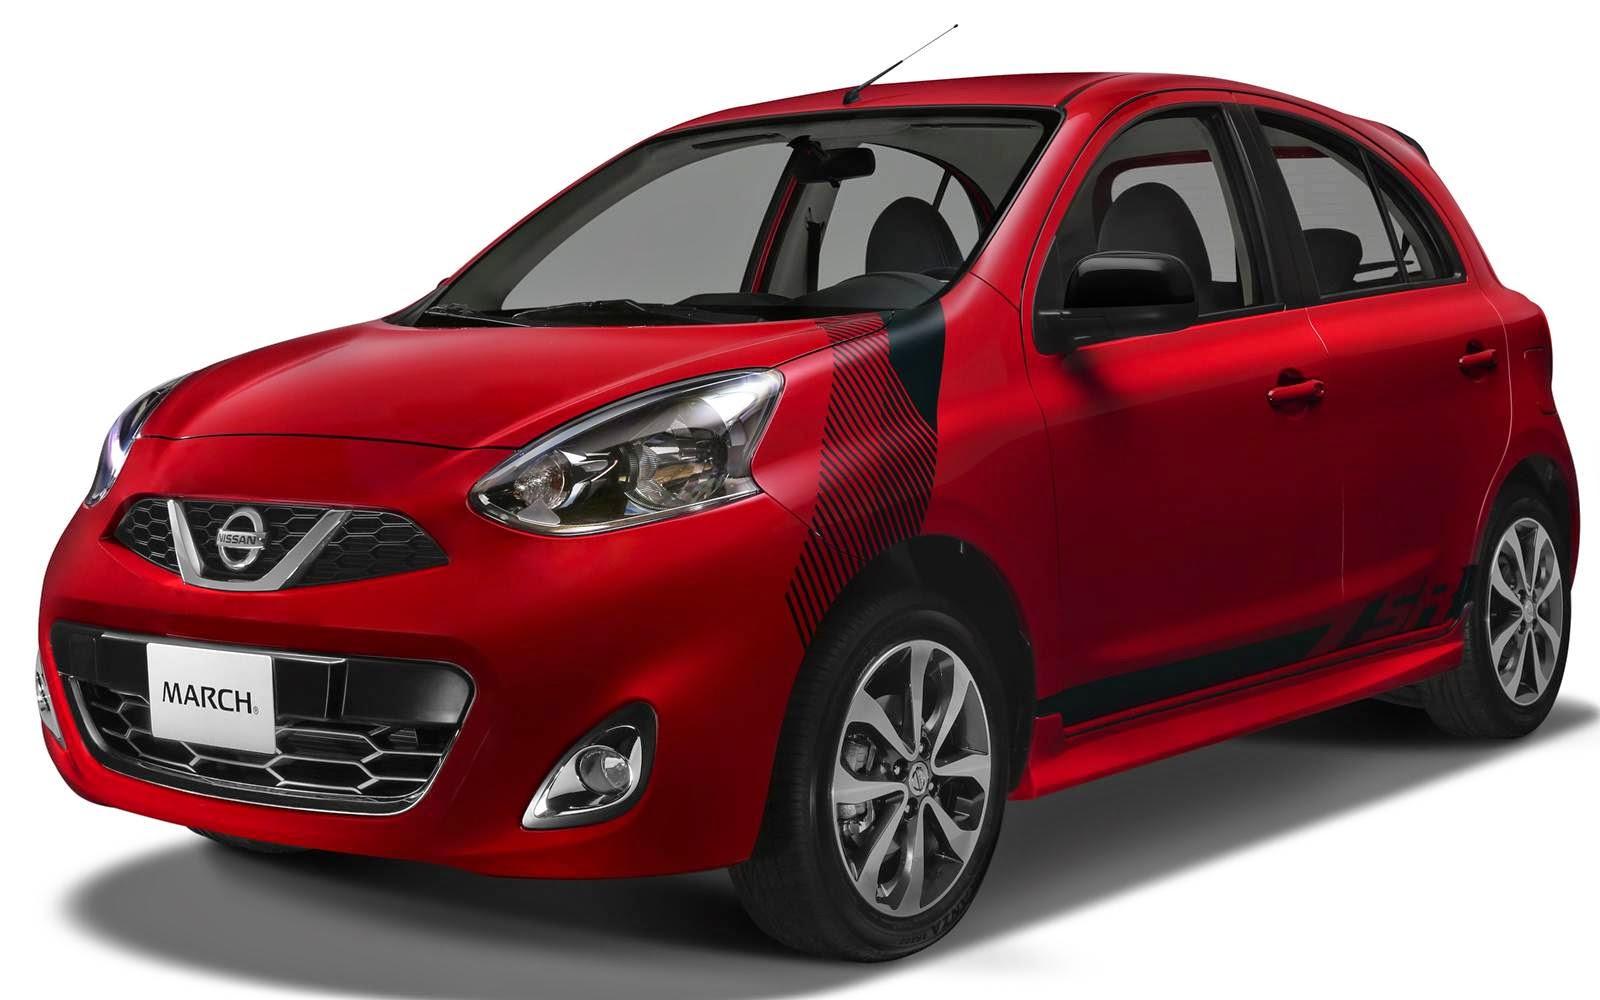 Mobil Nissan: Harga Mobil Nissan March 2017